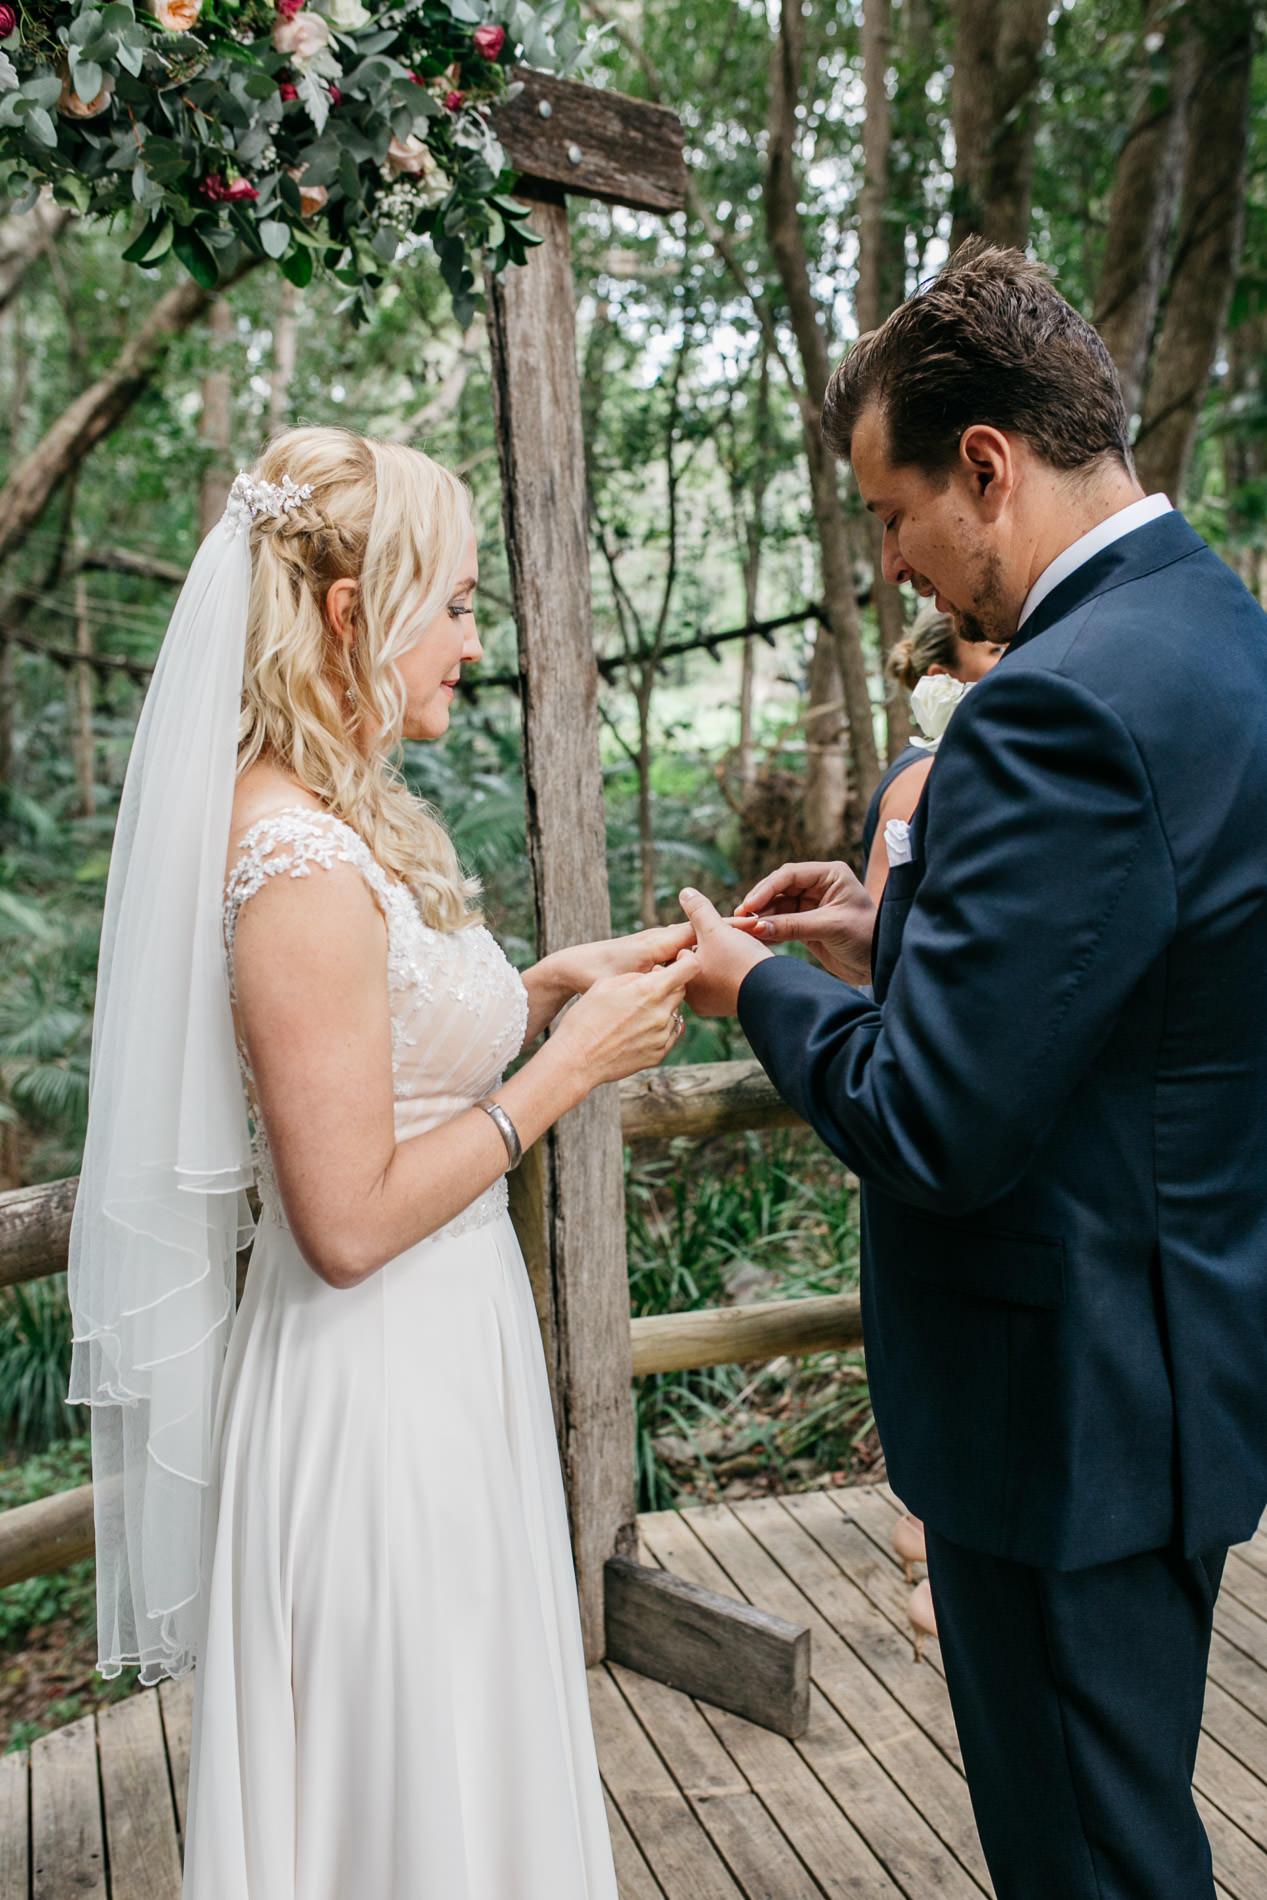 True North Photography_Boomerang Farm_Stacey and Isaac_Gold Coast Wedding_Barm Wedding_Hinterland Wedding-102.jpg